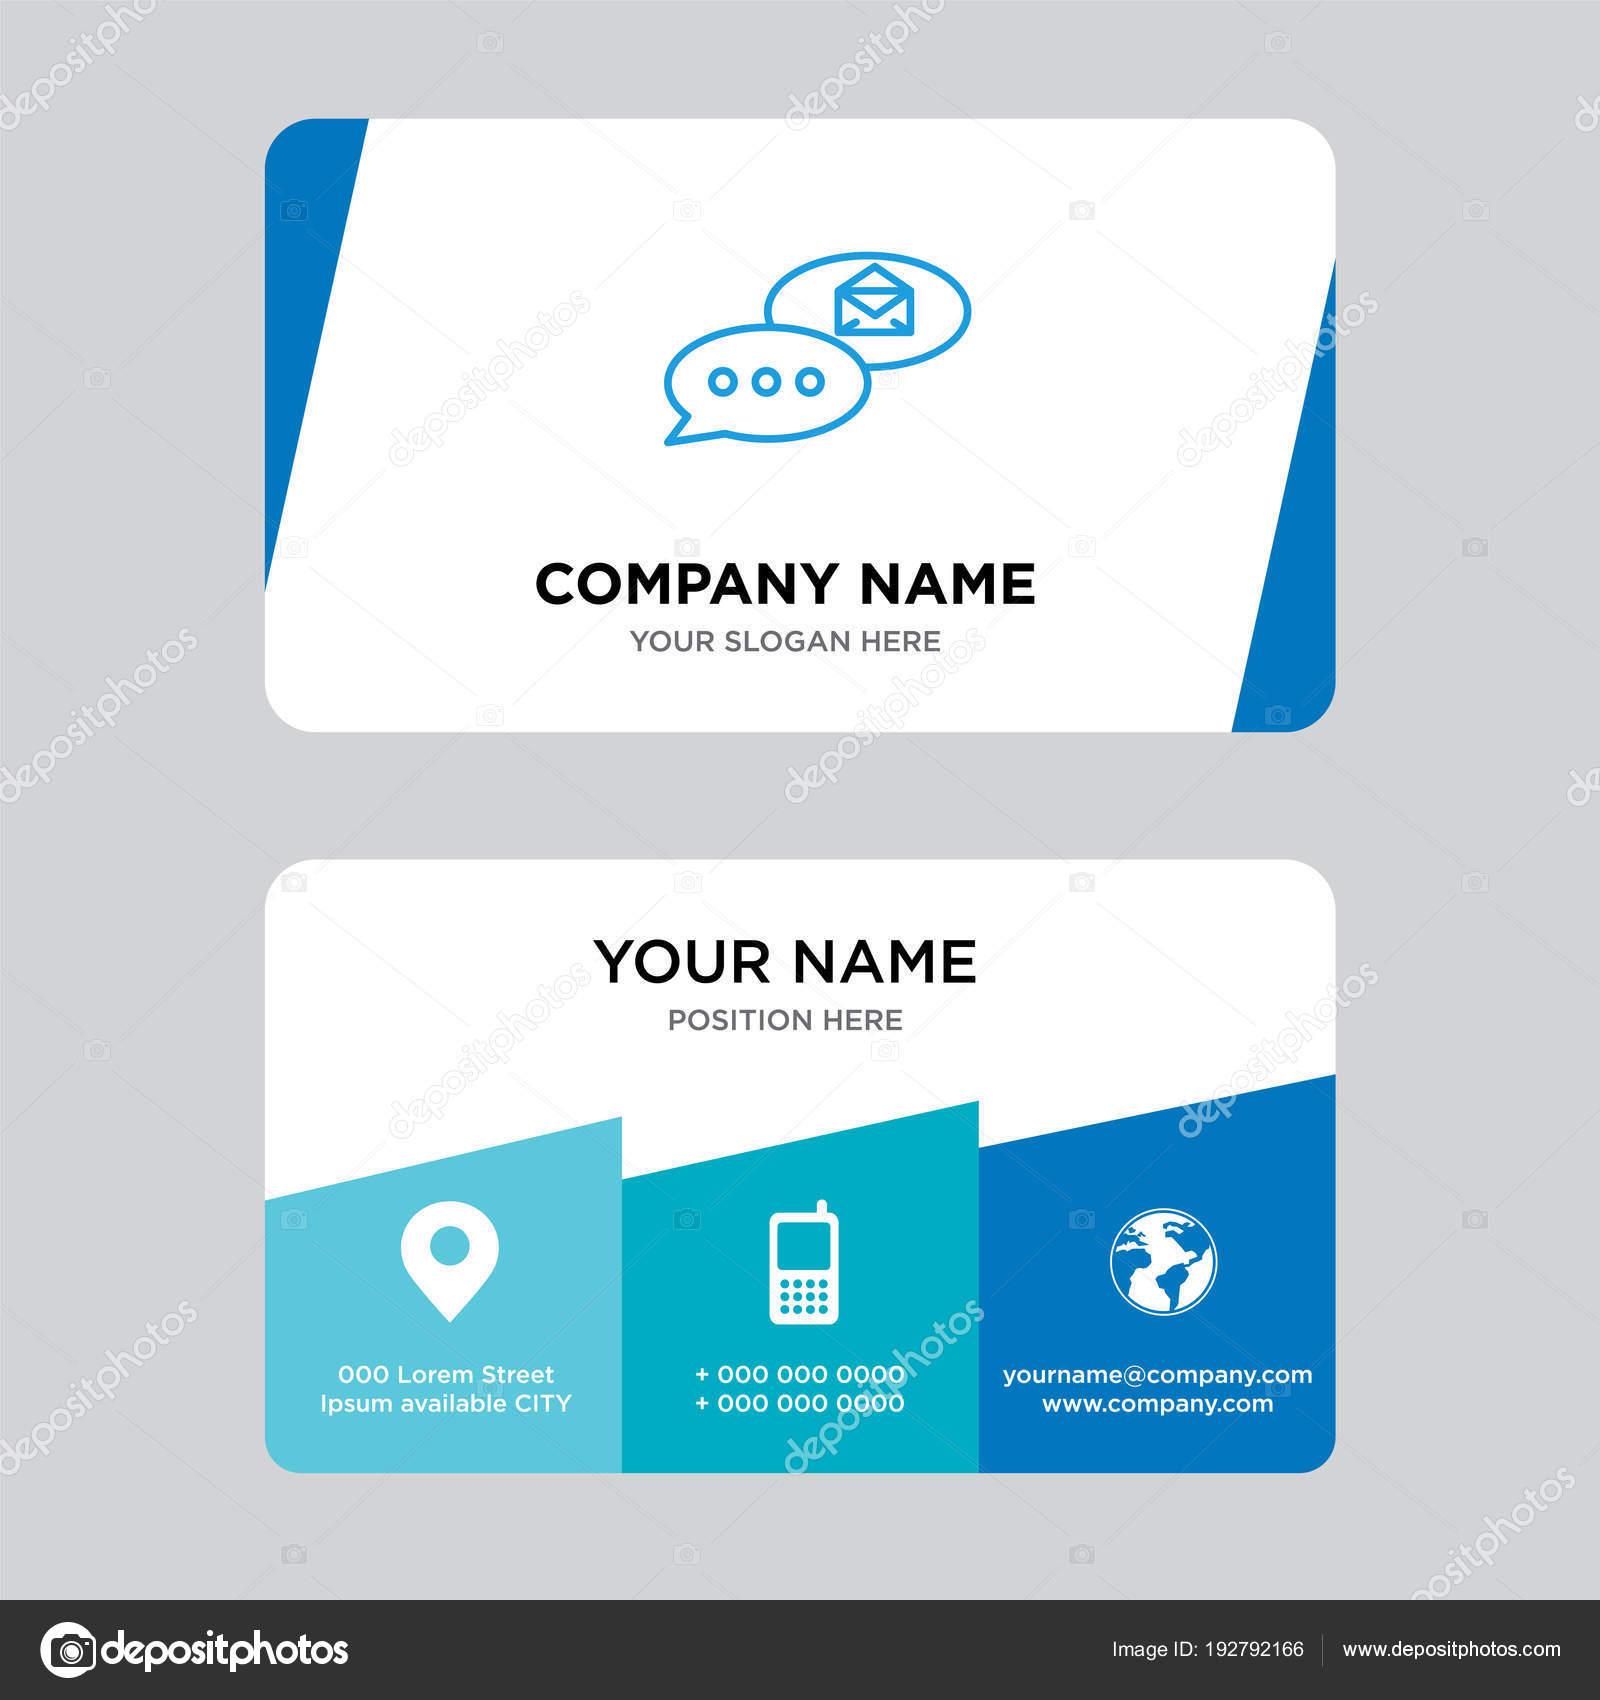 E Mail Chat Visitenkarte Design Vorlage Stockvektor